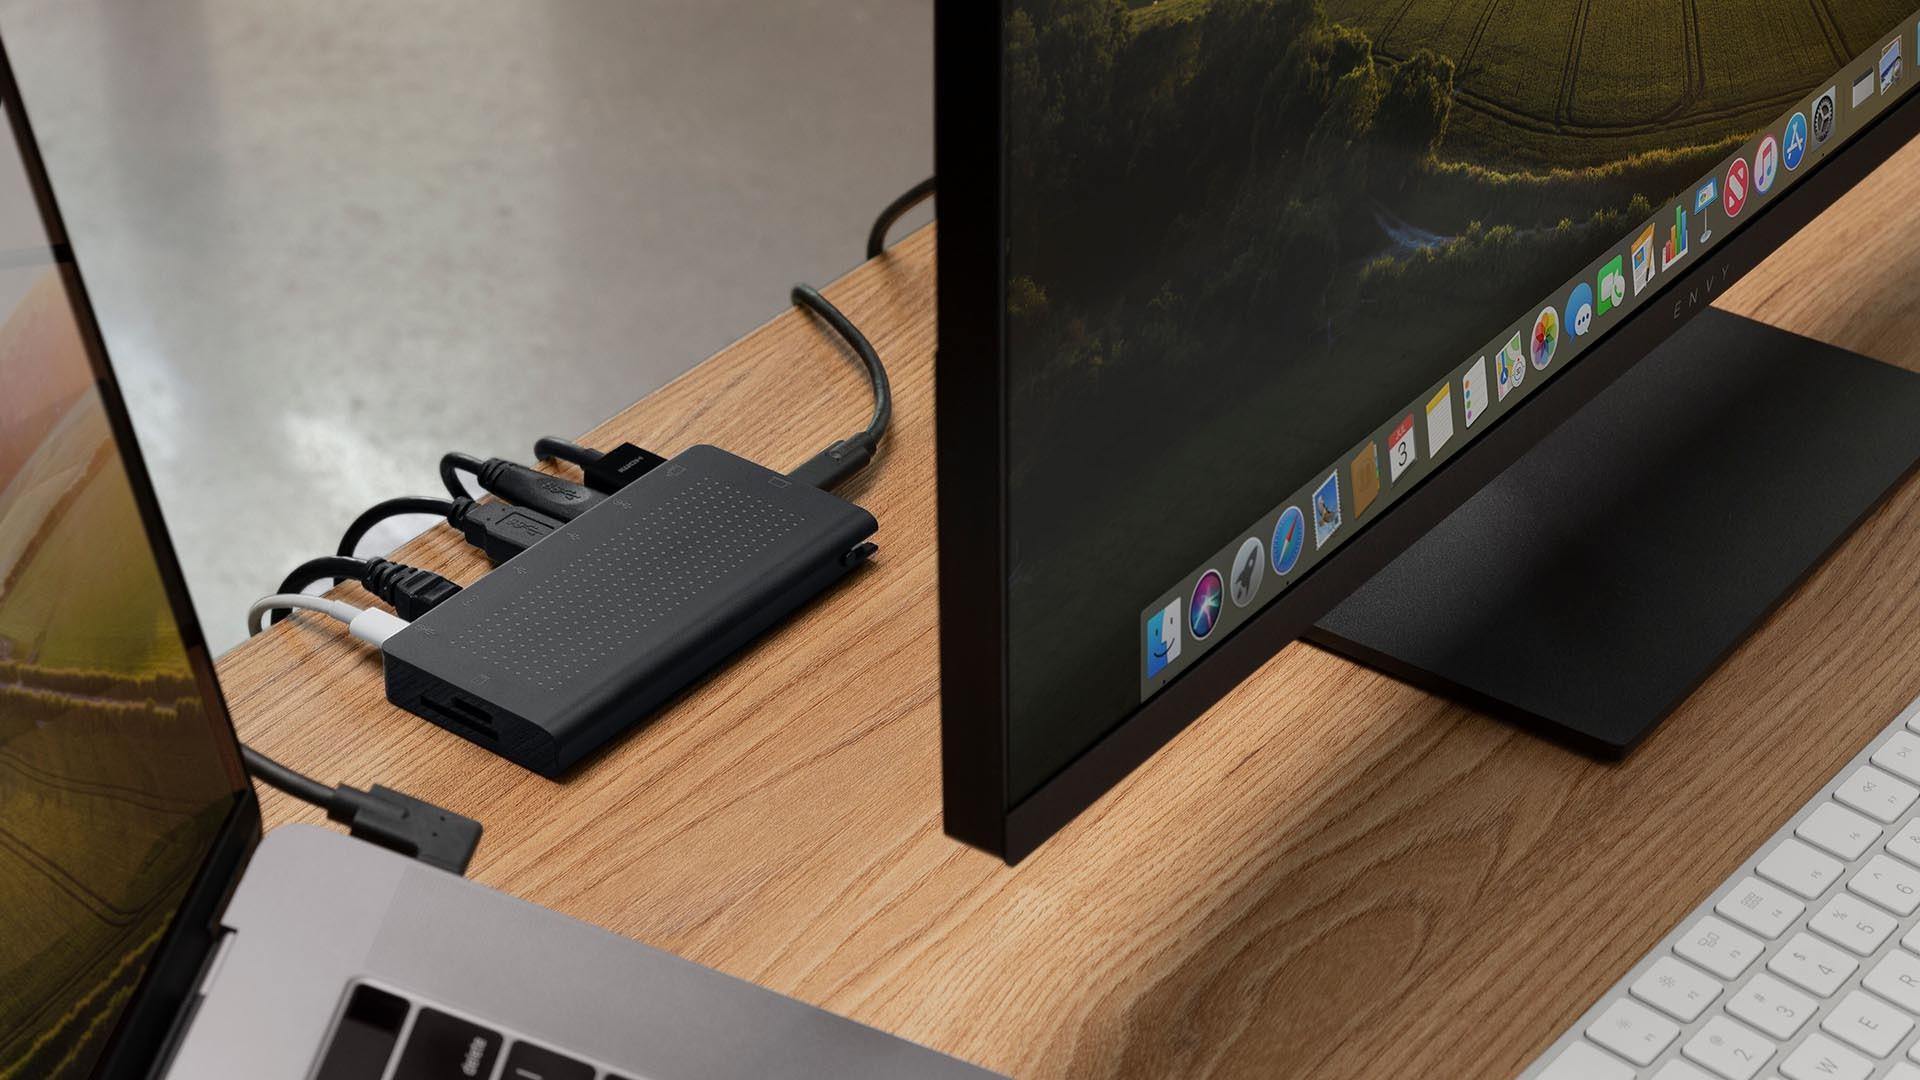 USBハブ「StayGo USB-C Hub」00